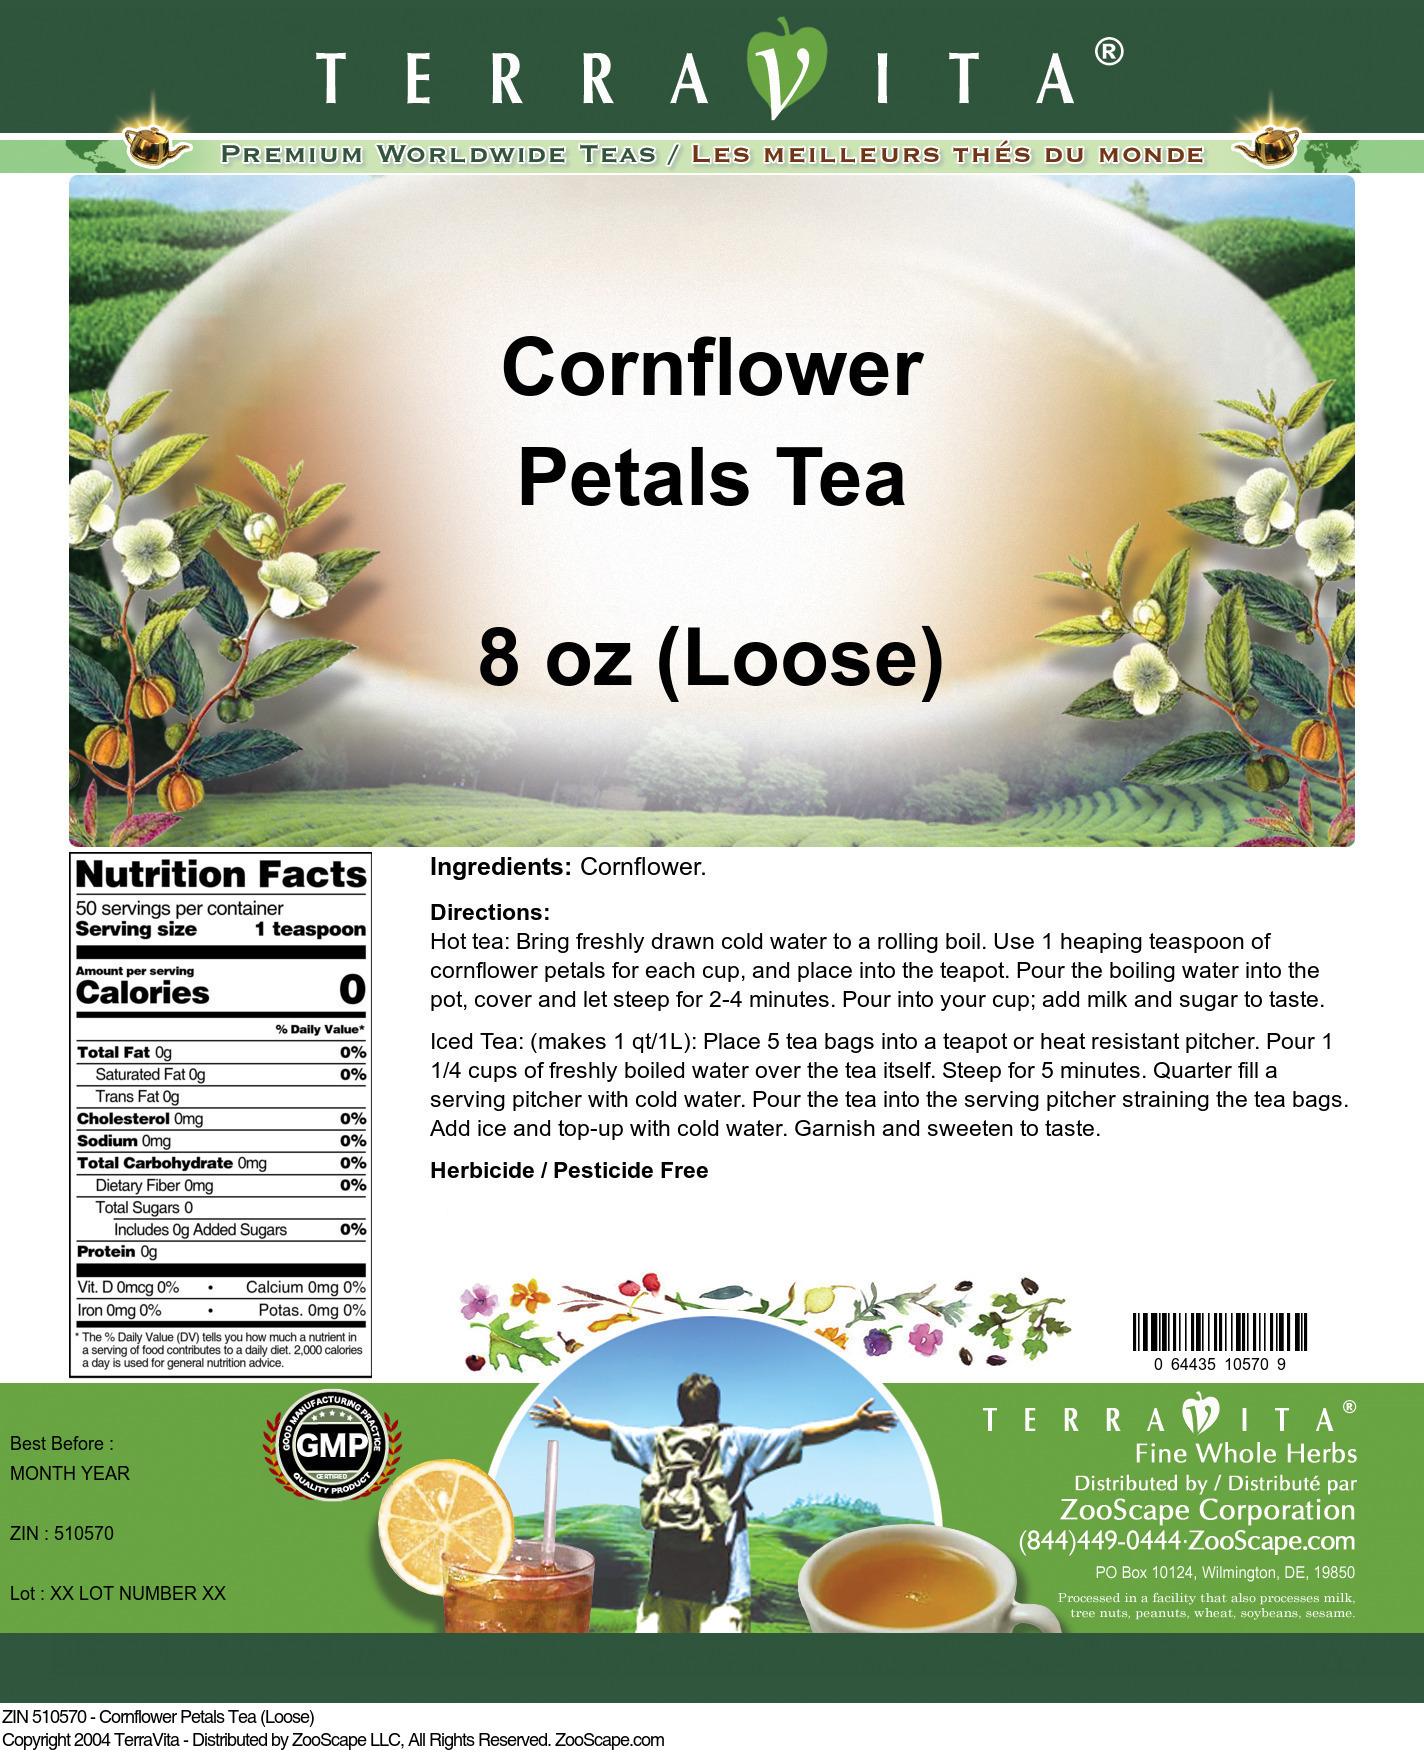 Cornflower Petals Tea (Loose)